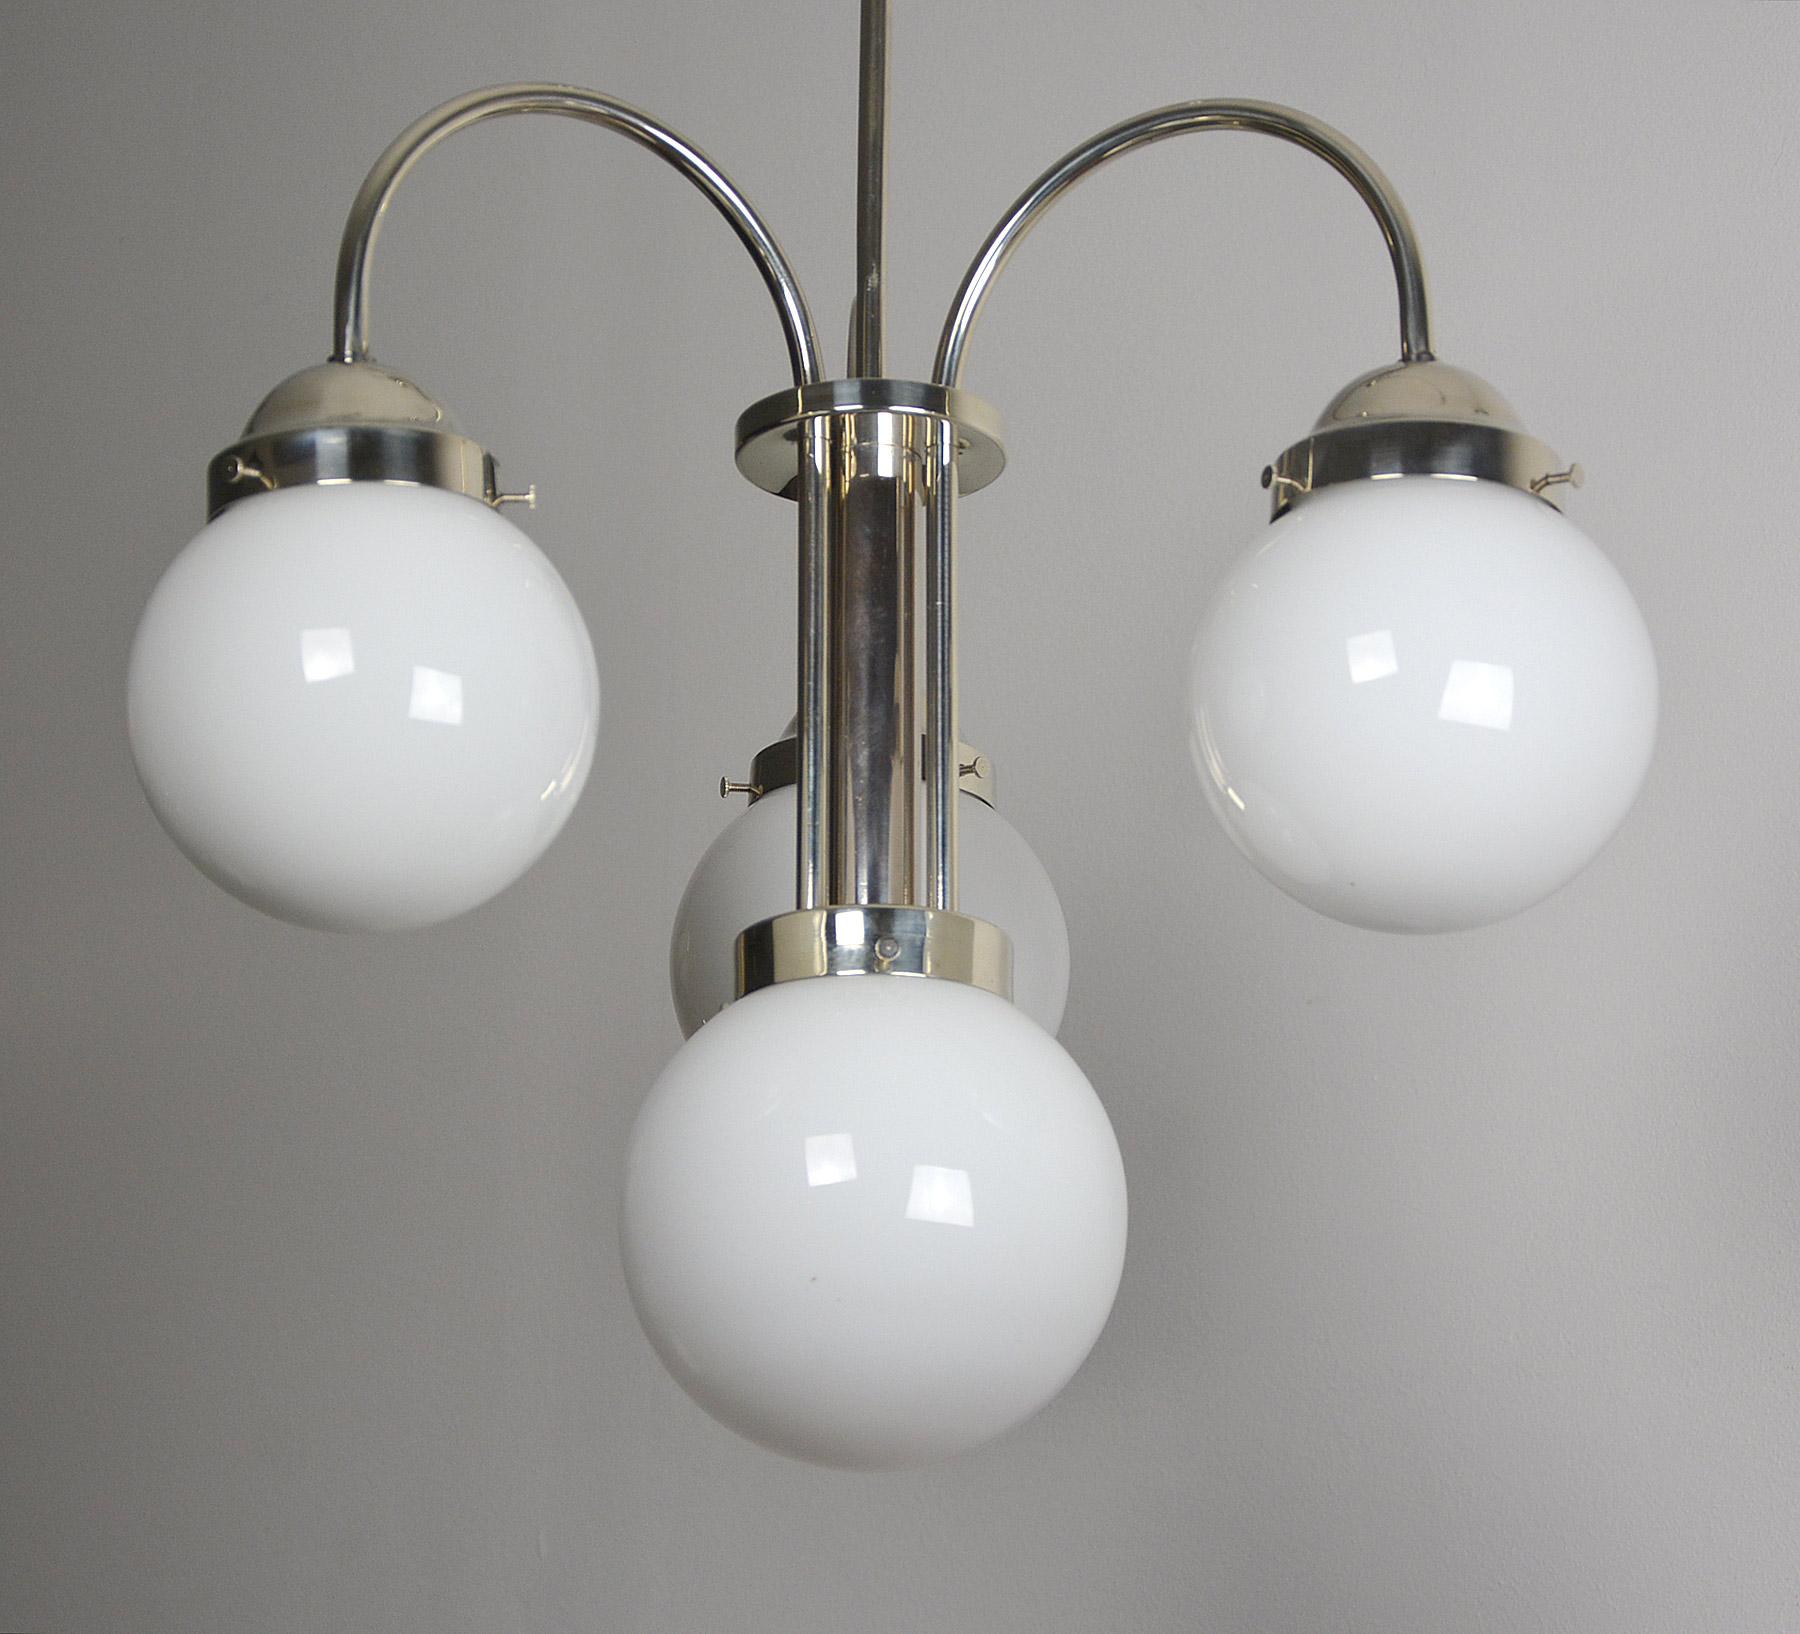 bauhaus art deco deckenlampe nickel ebay. Black Bedroom Furniture Sets. Home Design Ideas